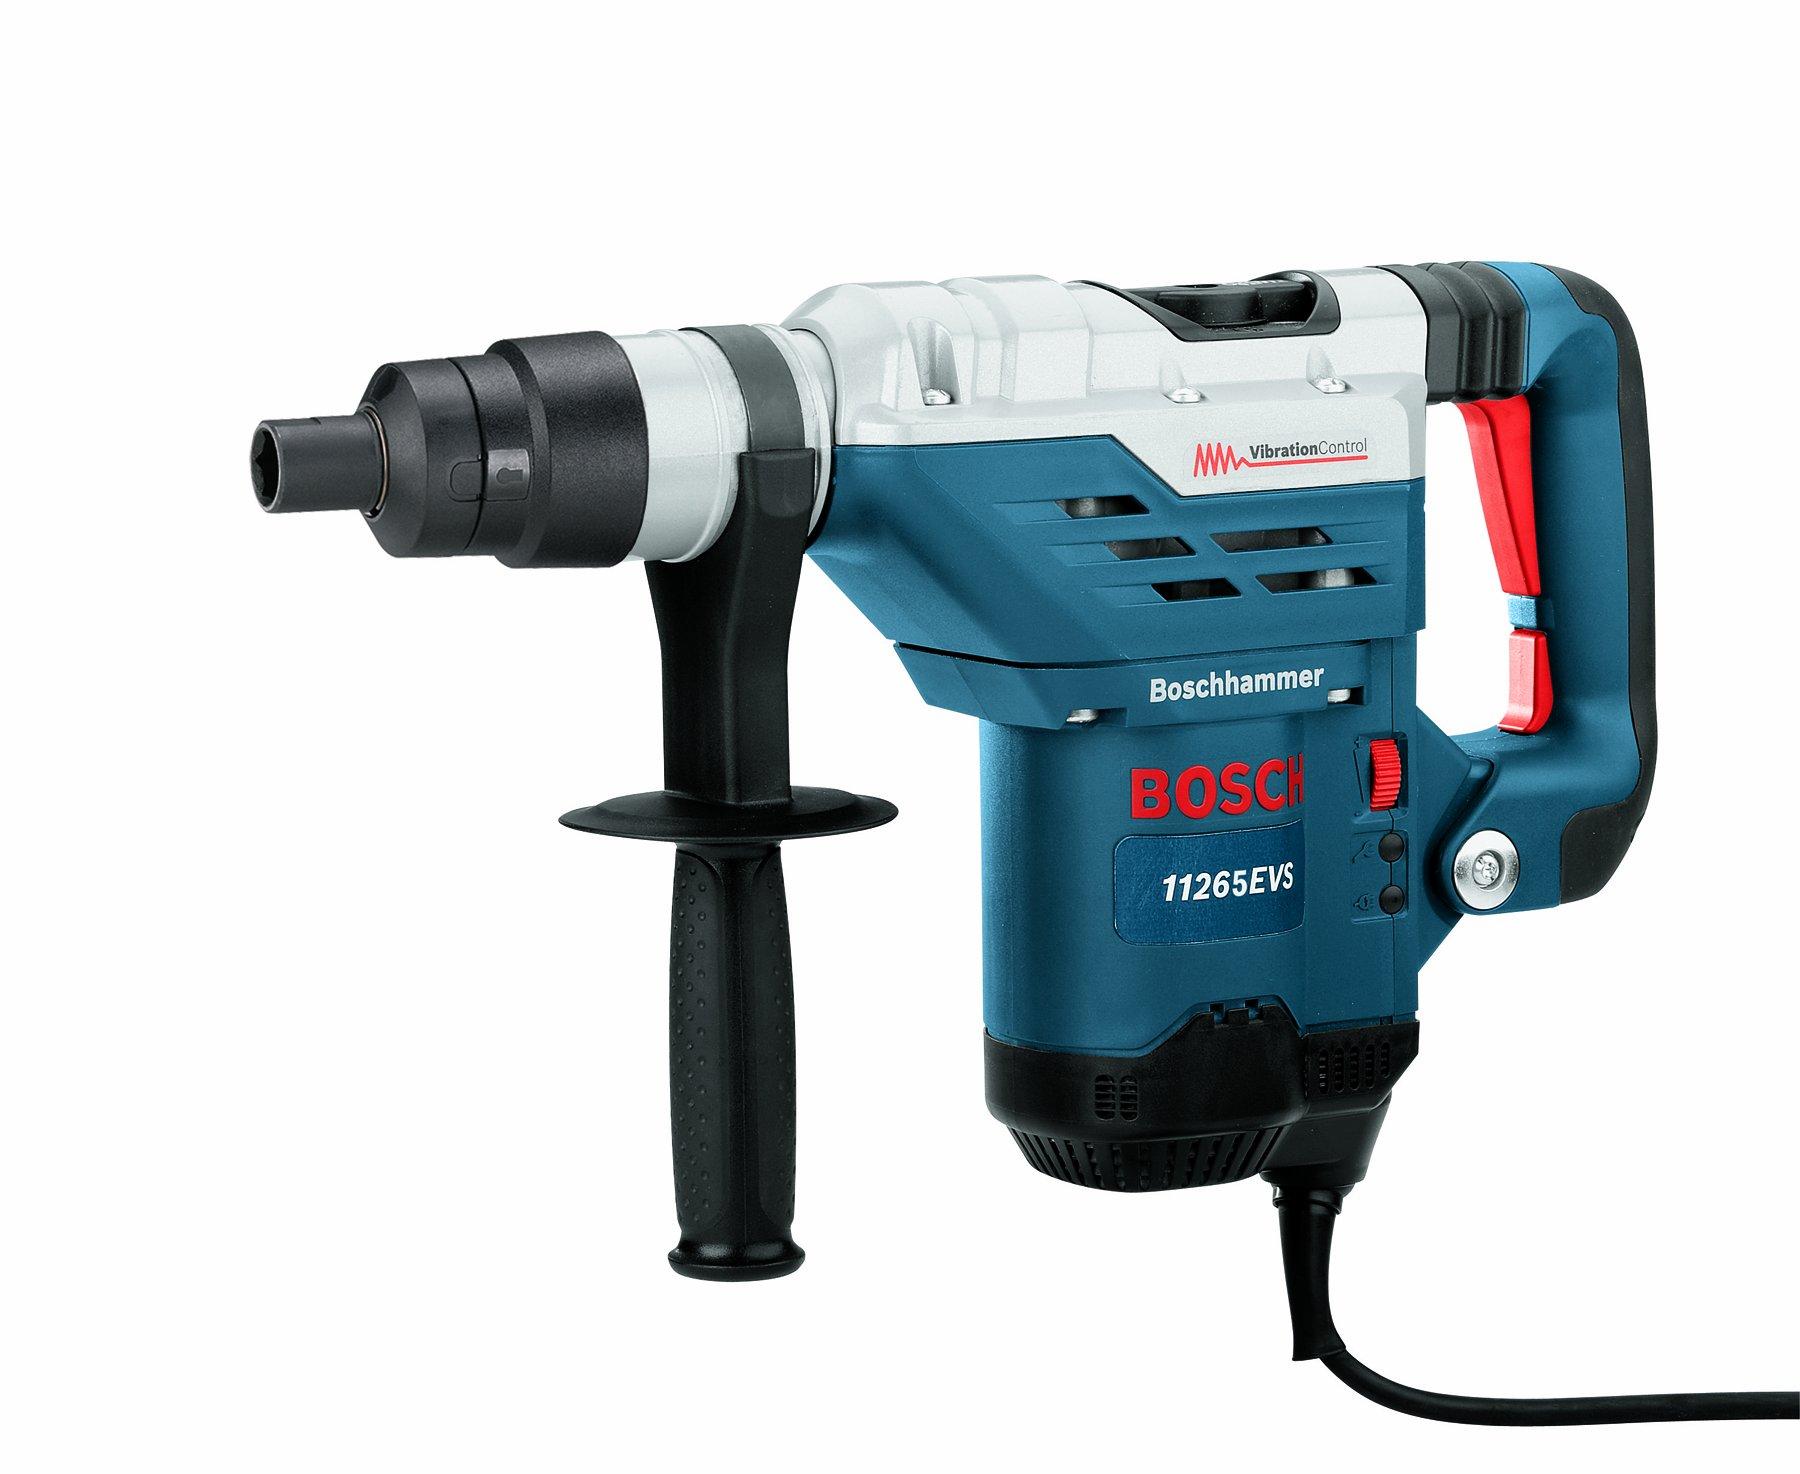 Bosch 11265EVS 1-5/8 Spline Combination Hammer by Bosch